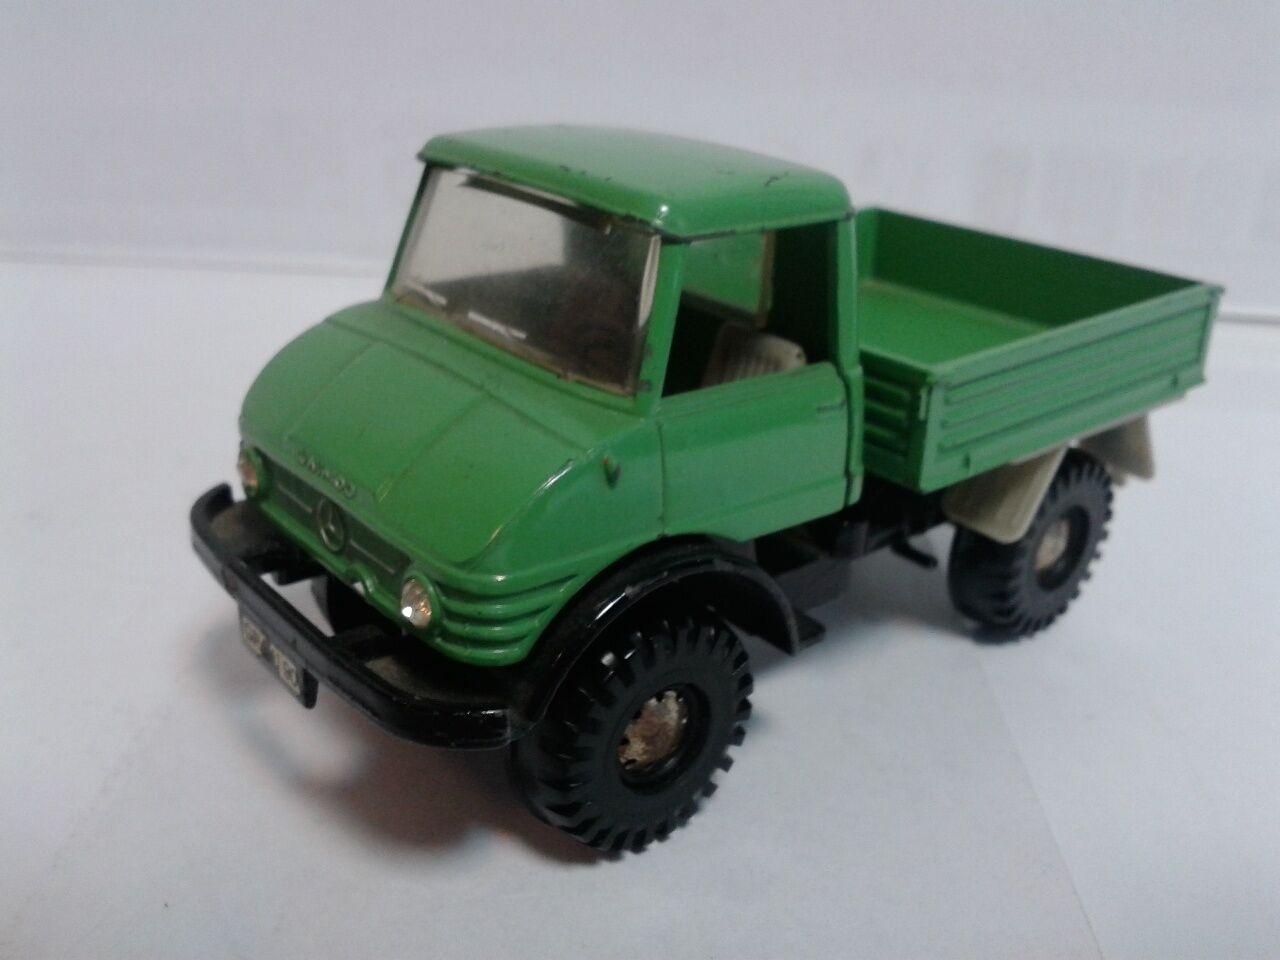 Marklin 1830 Mercedes UNIMOG light green 1970 1 43 near mint no box